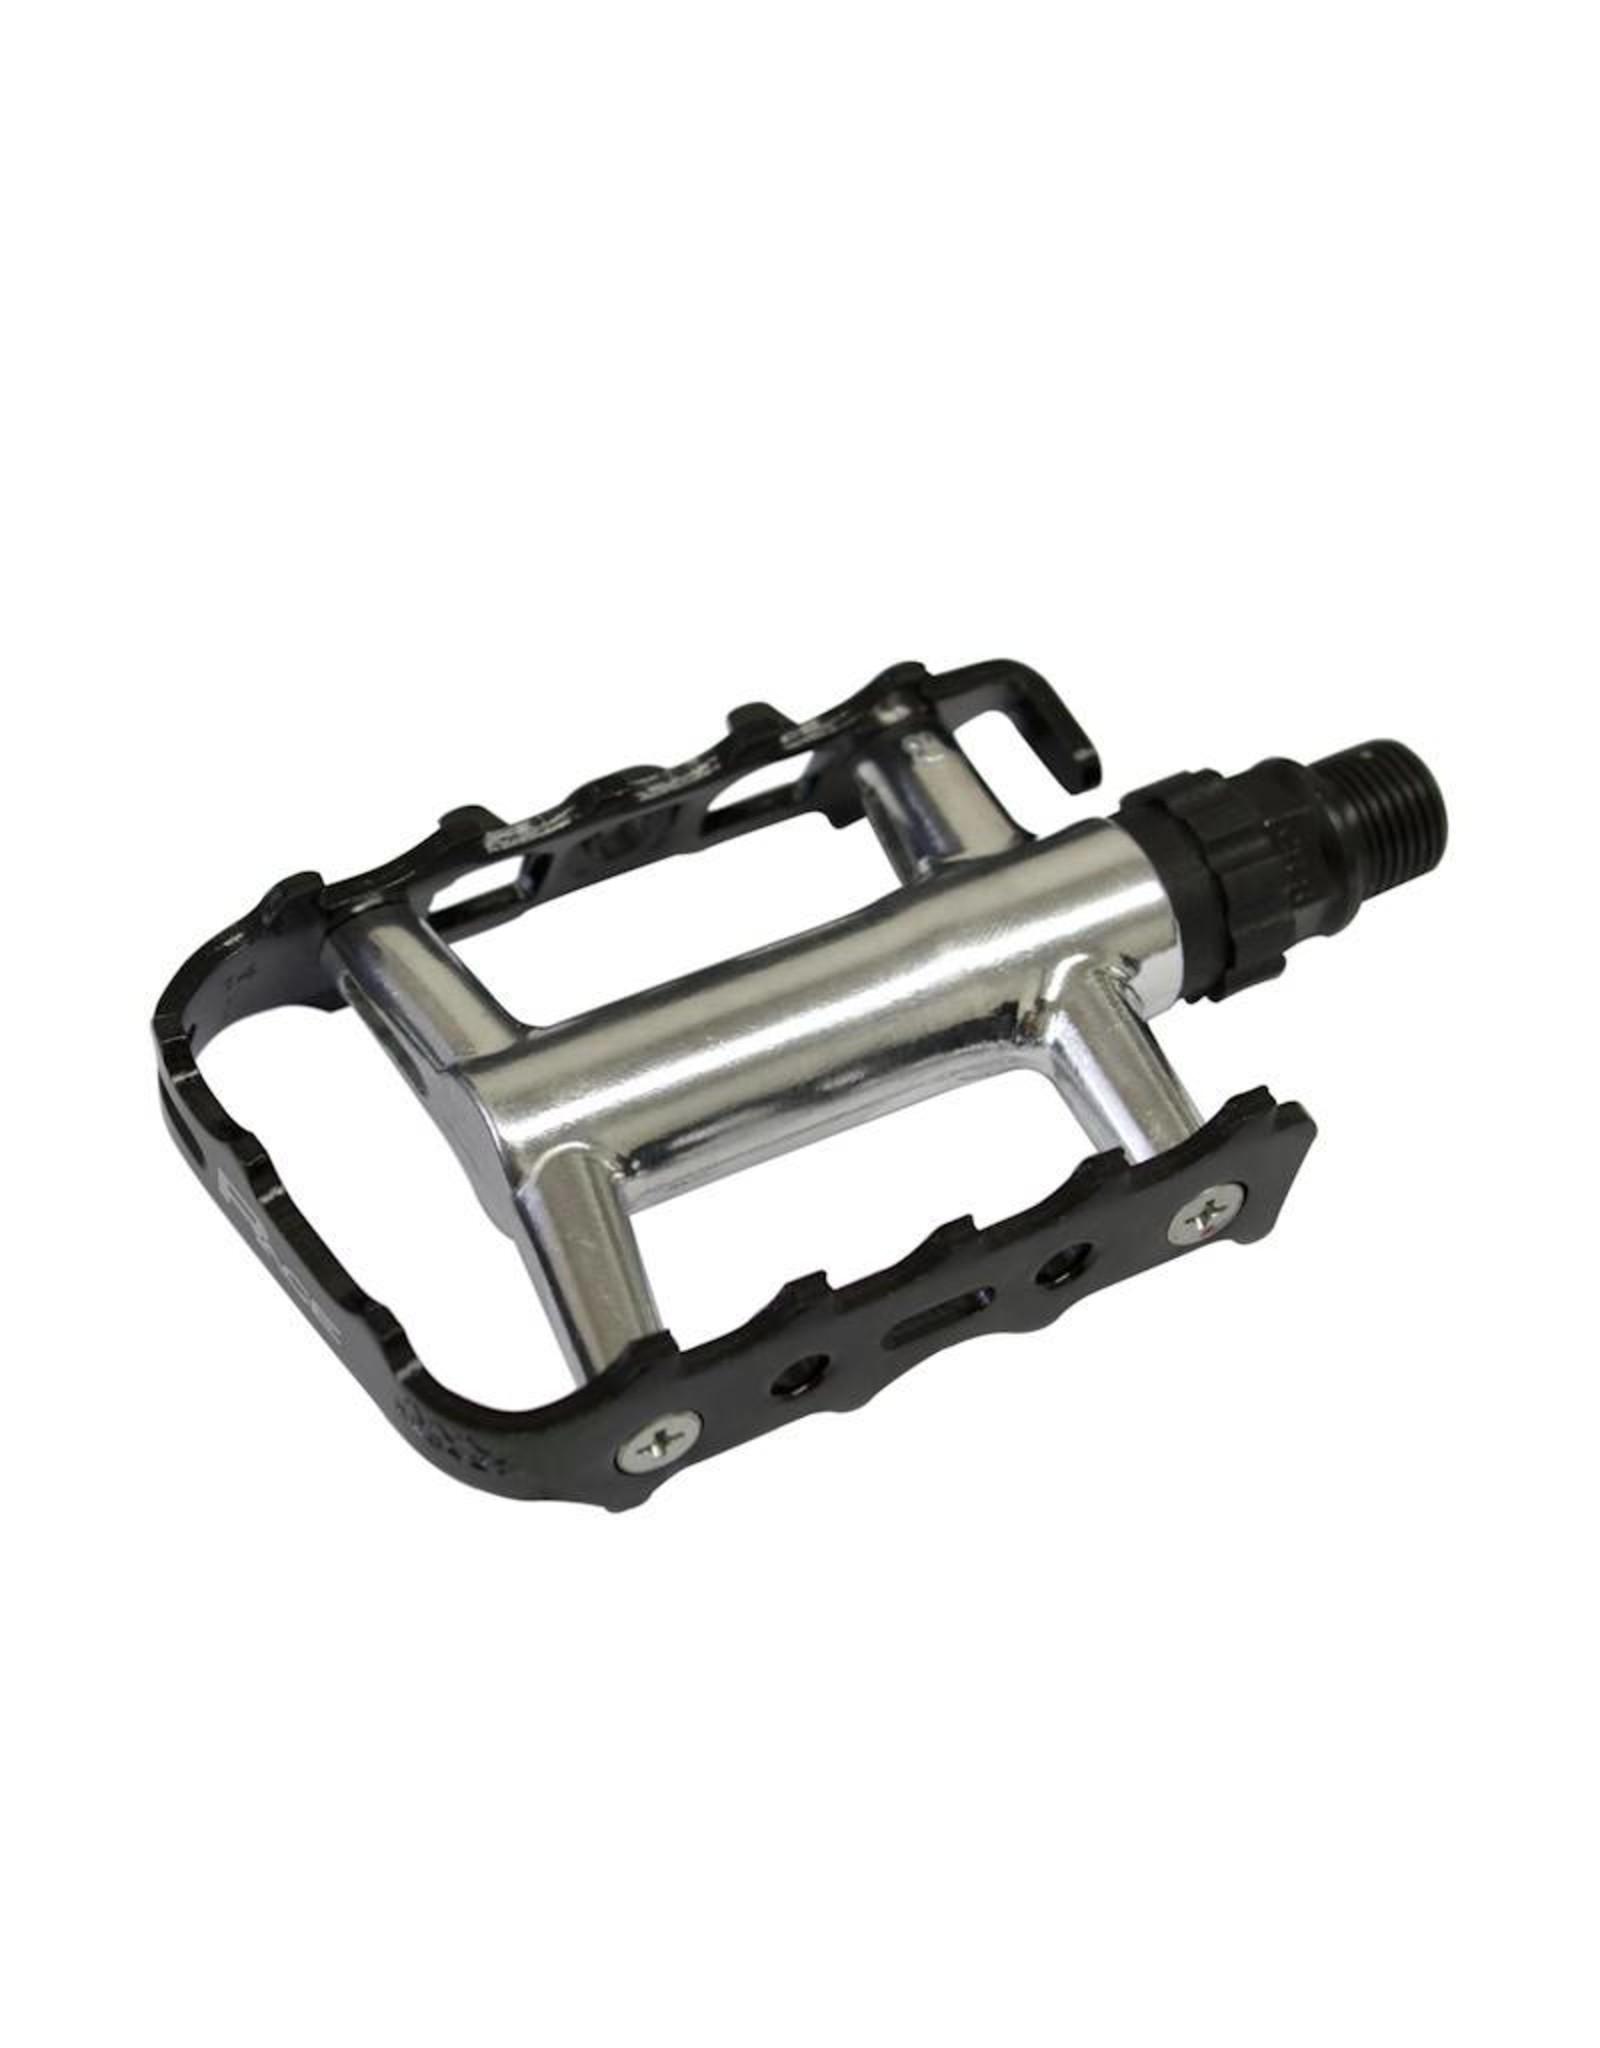 Race LU-950 pedals